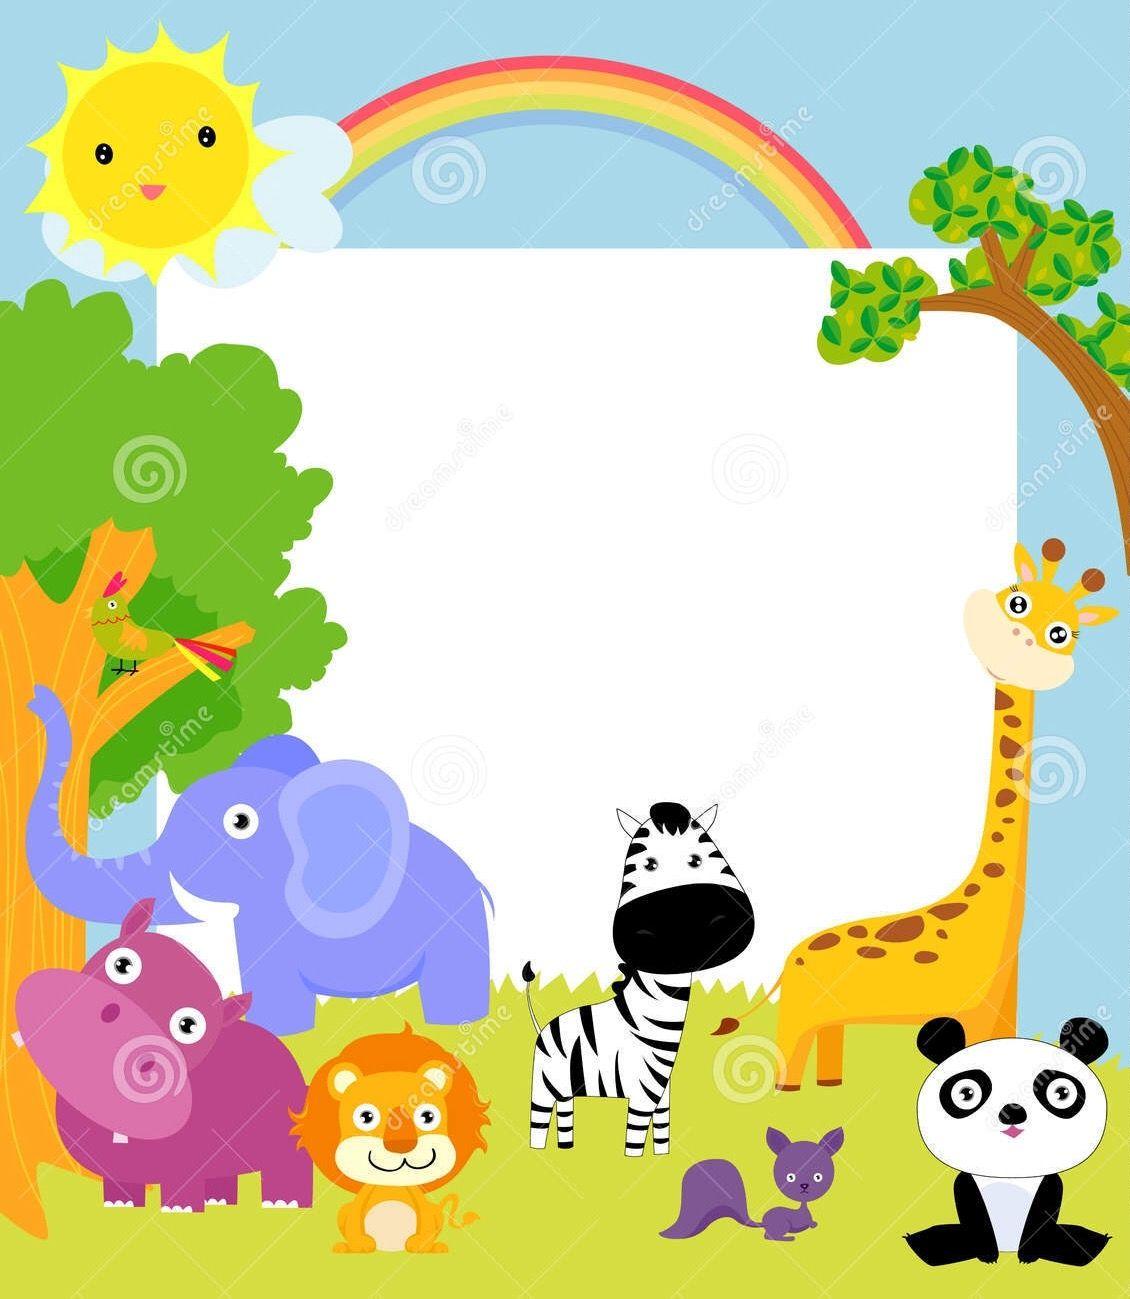 Pin de Αρχοντούλα Σταθάκη en KIDS FRAMES | Pinterest | Cuadros ...